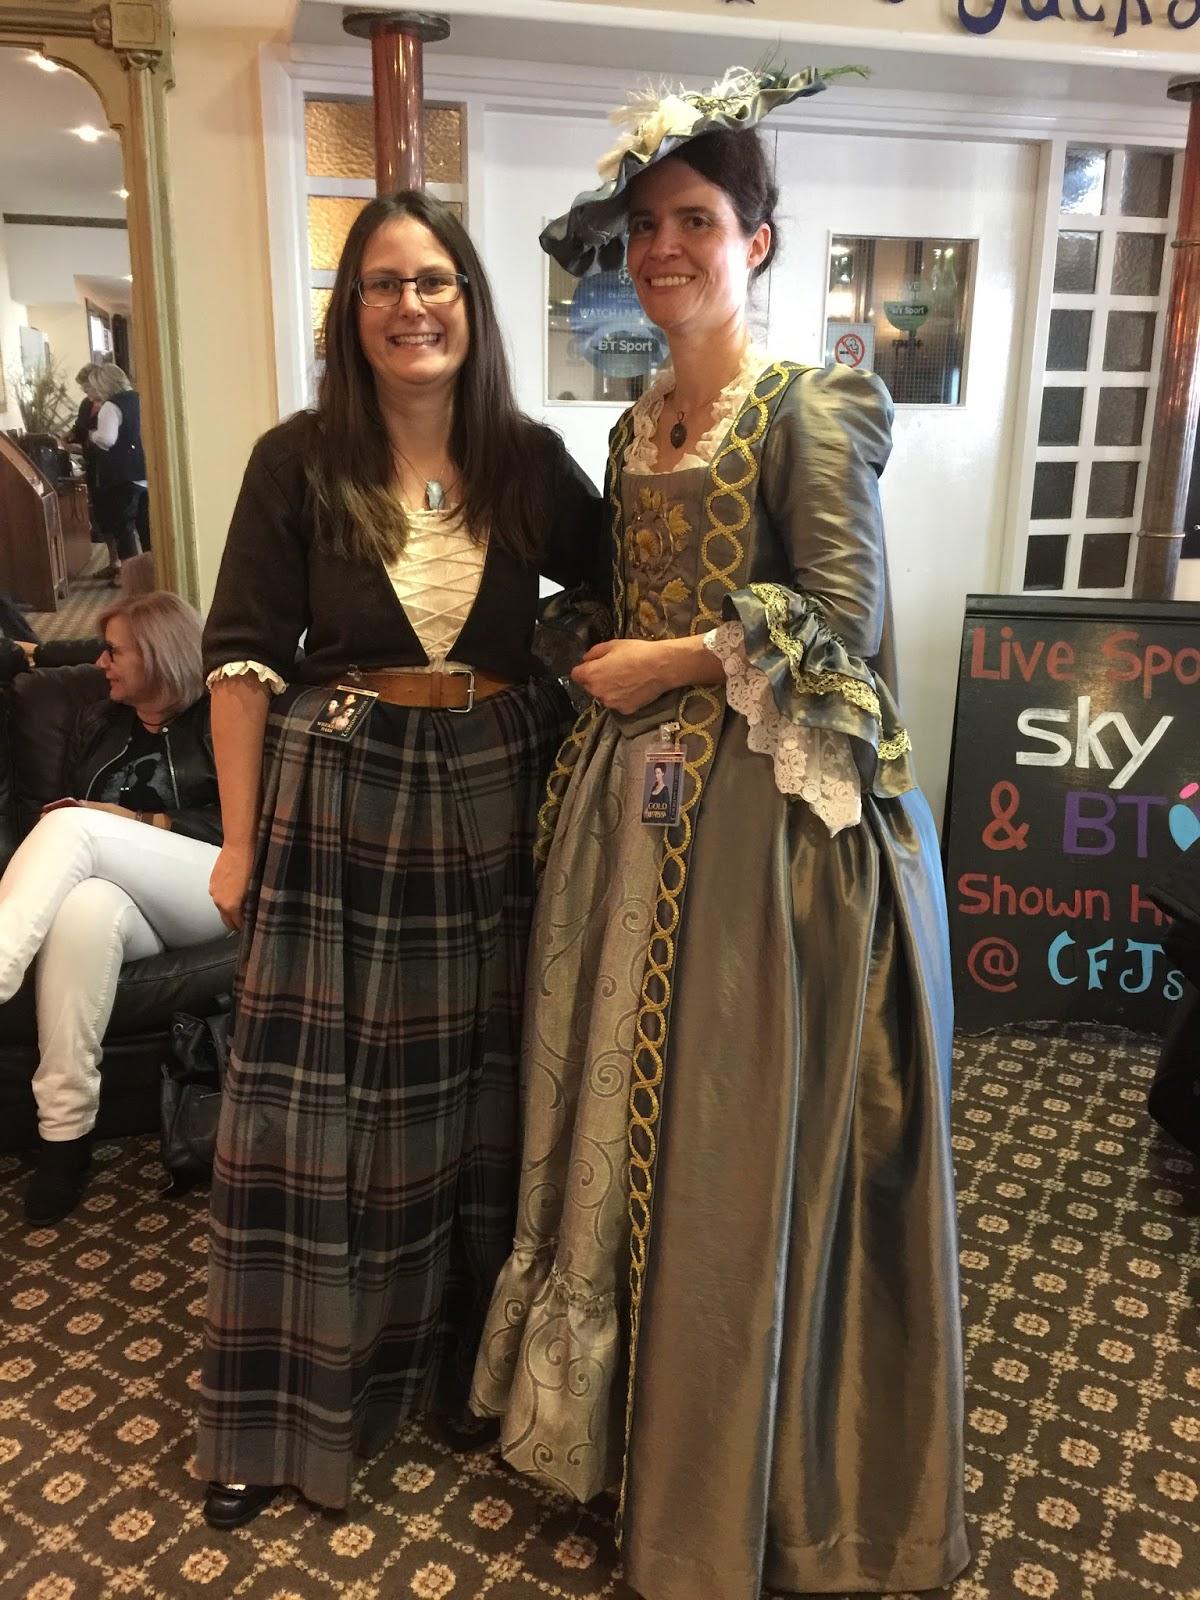 highlanders 2, starfury, outlander, outlander cast